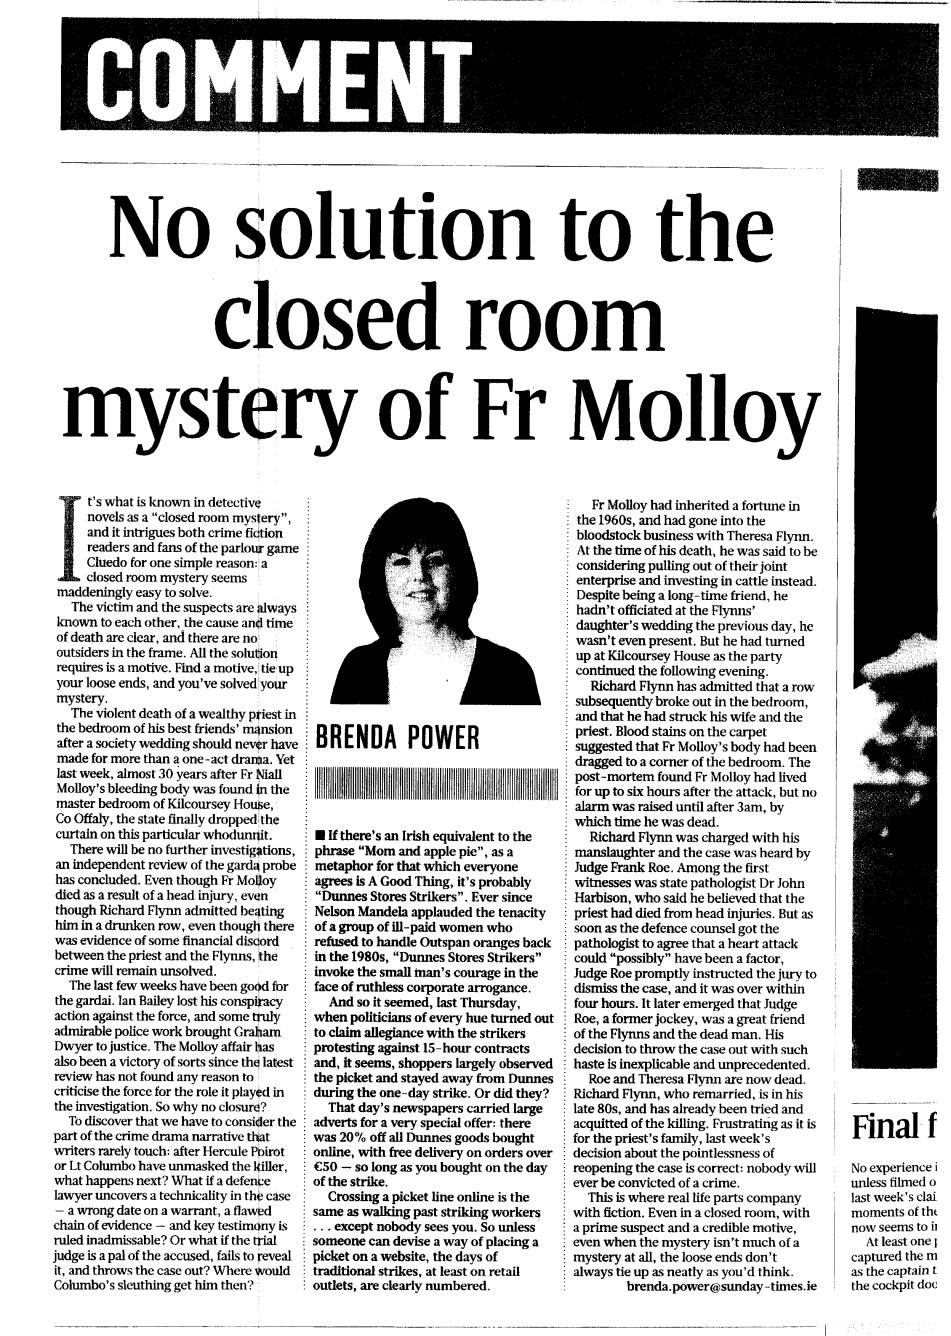 Brenda Power - Sunday Times. April 2015